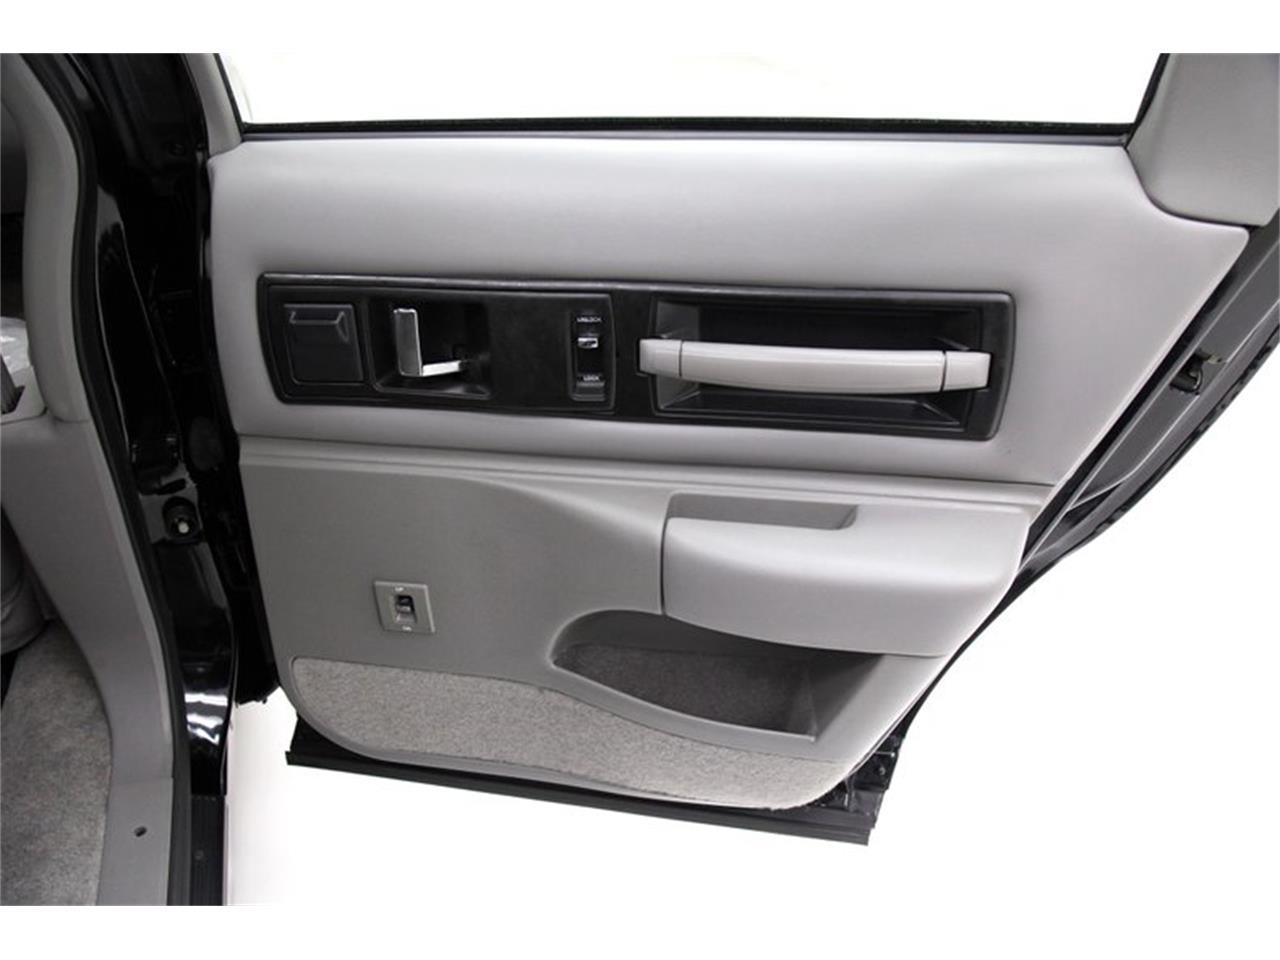 1996 Chevrolet Impala (CC-1417061) for sale in Morgantown, Pennsylvania